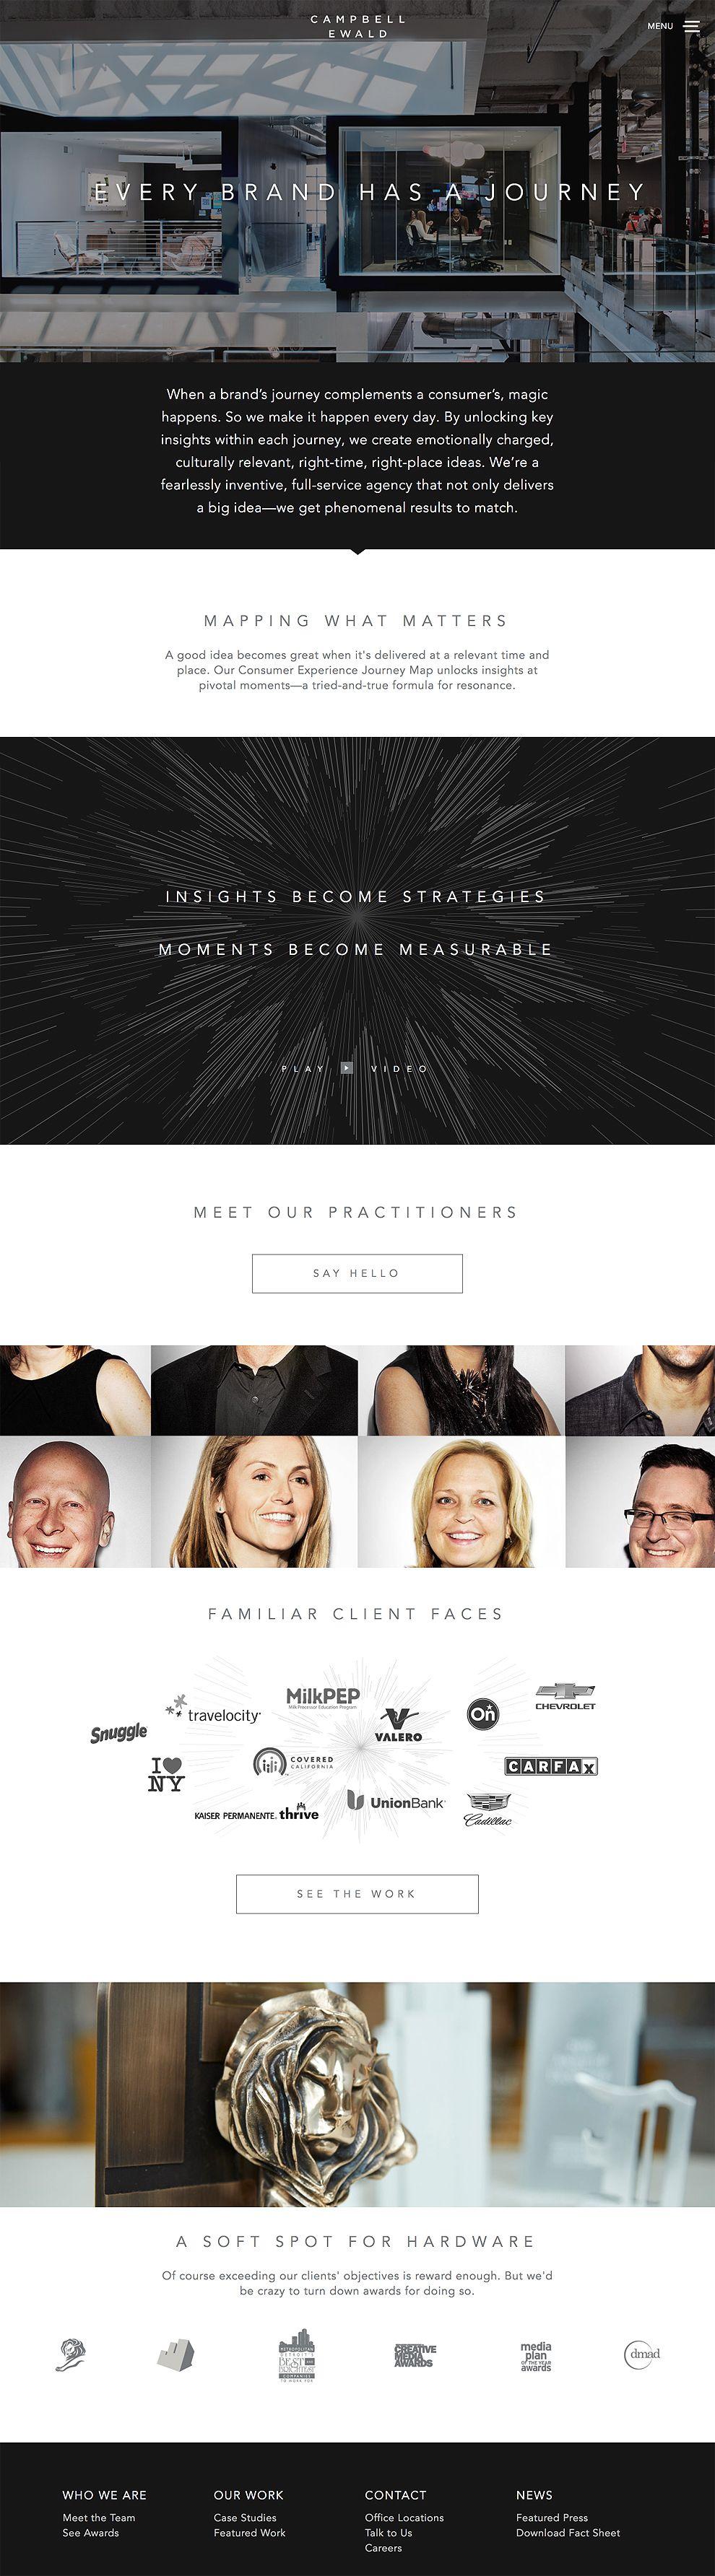 Campbell Ewald Top Website Design